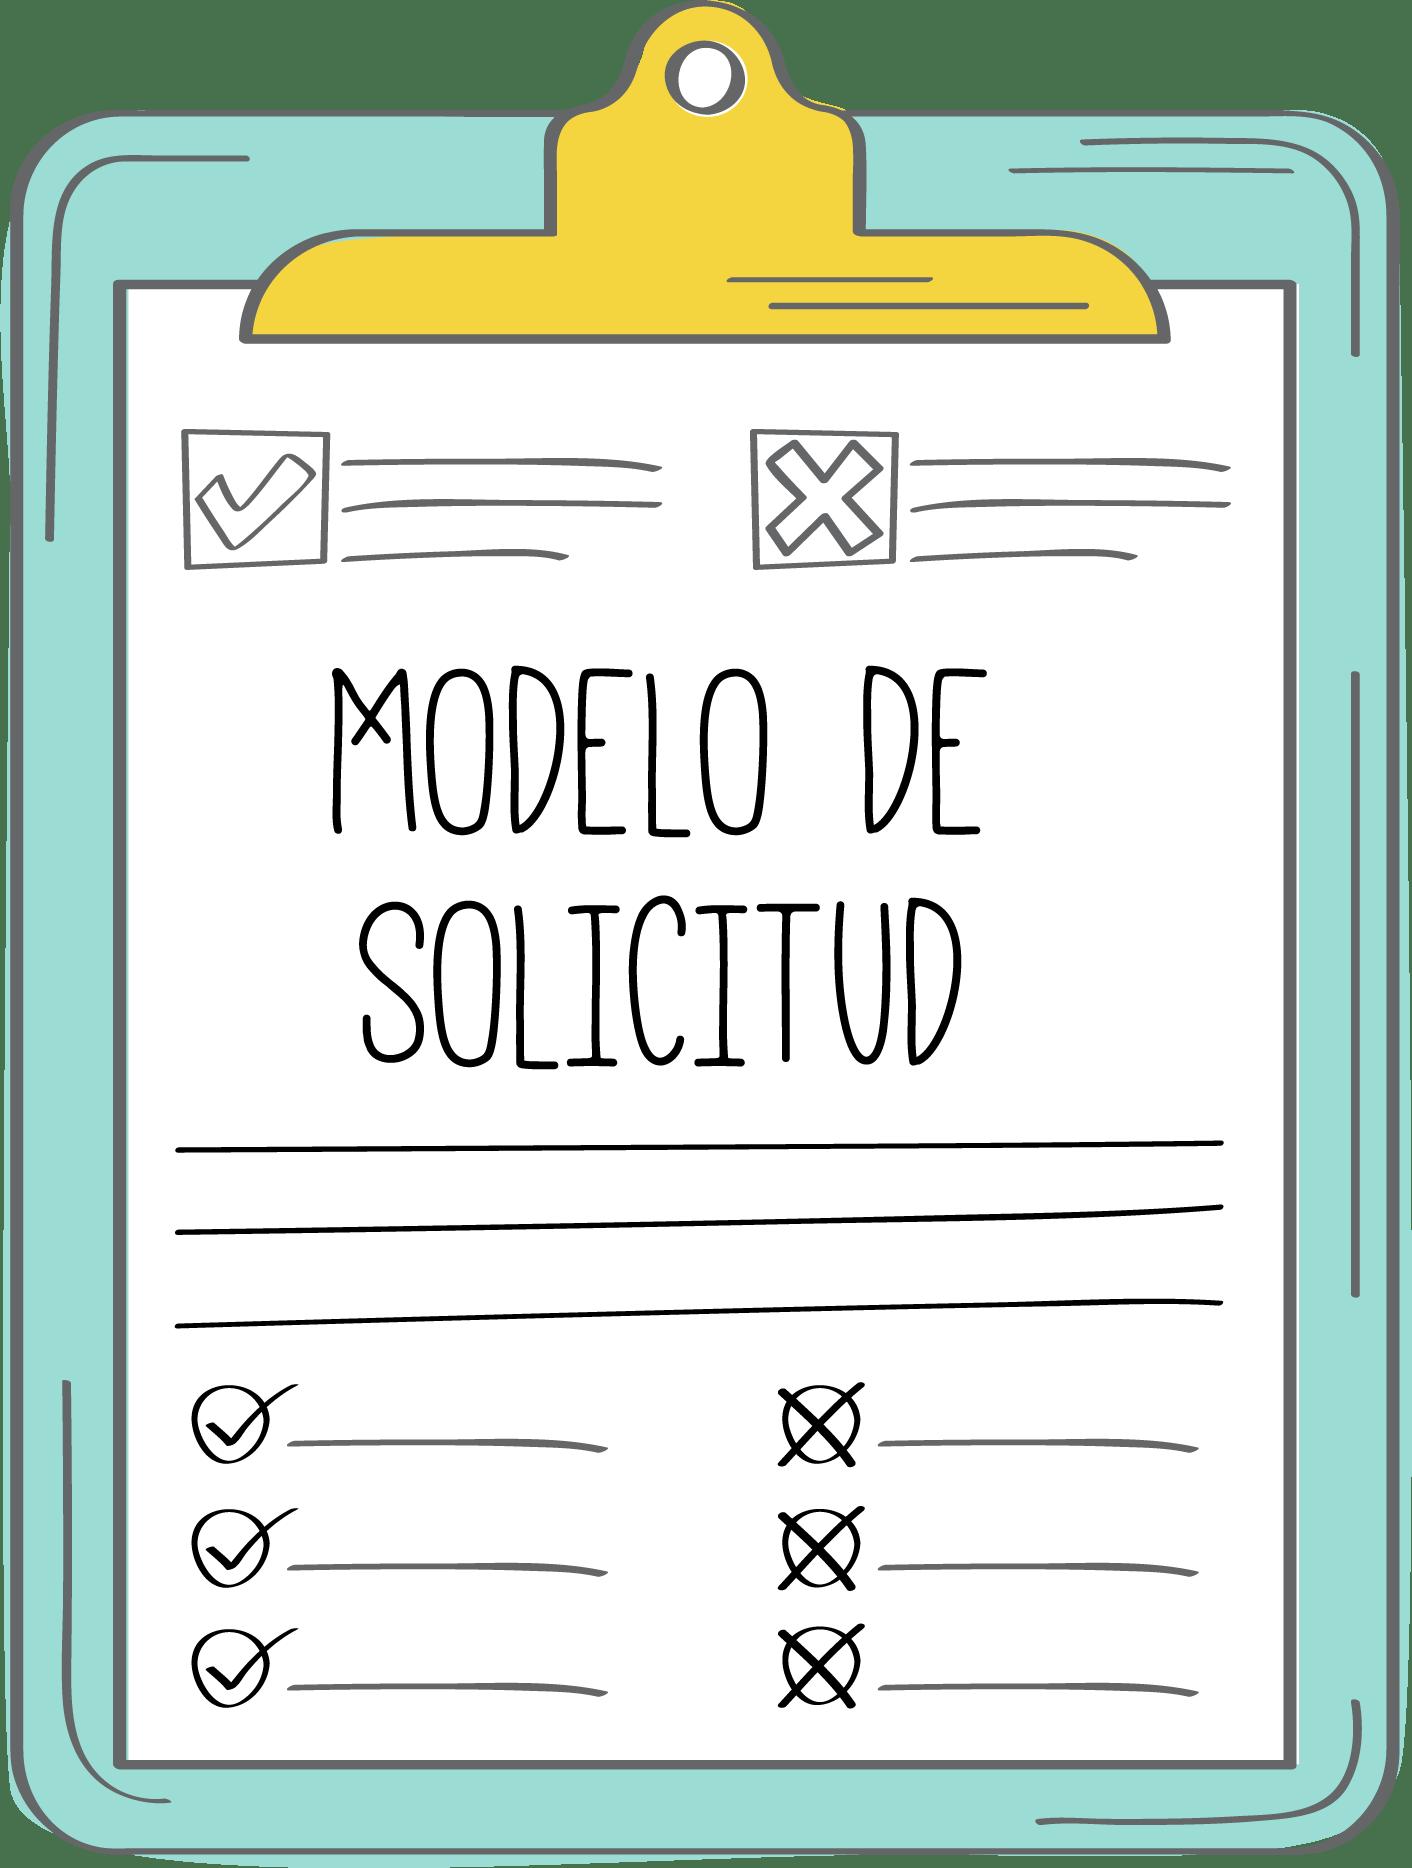 MODELO DE SOLICITUD